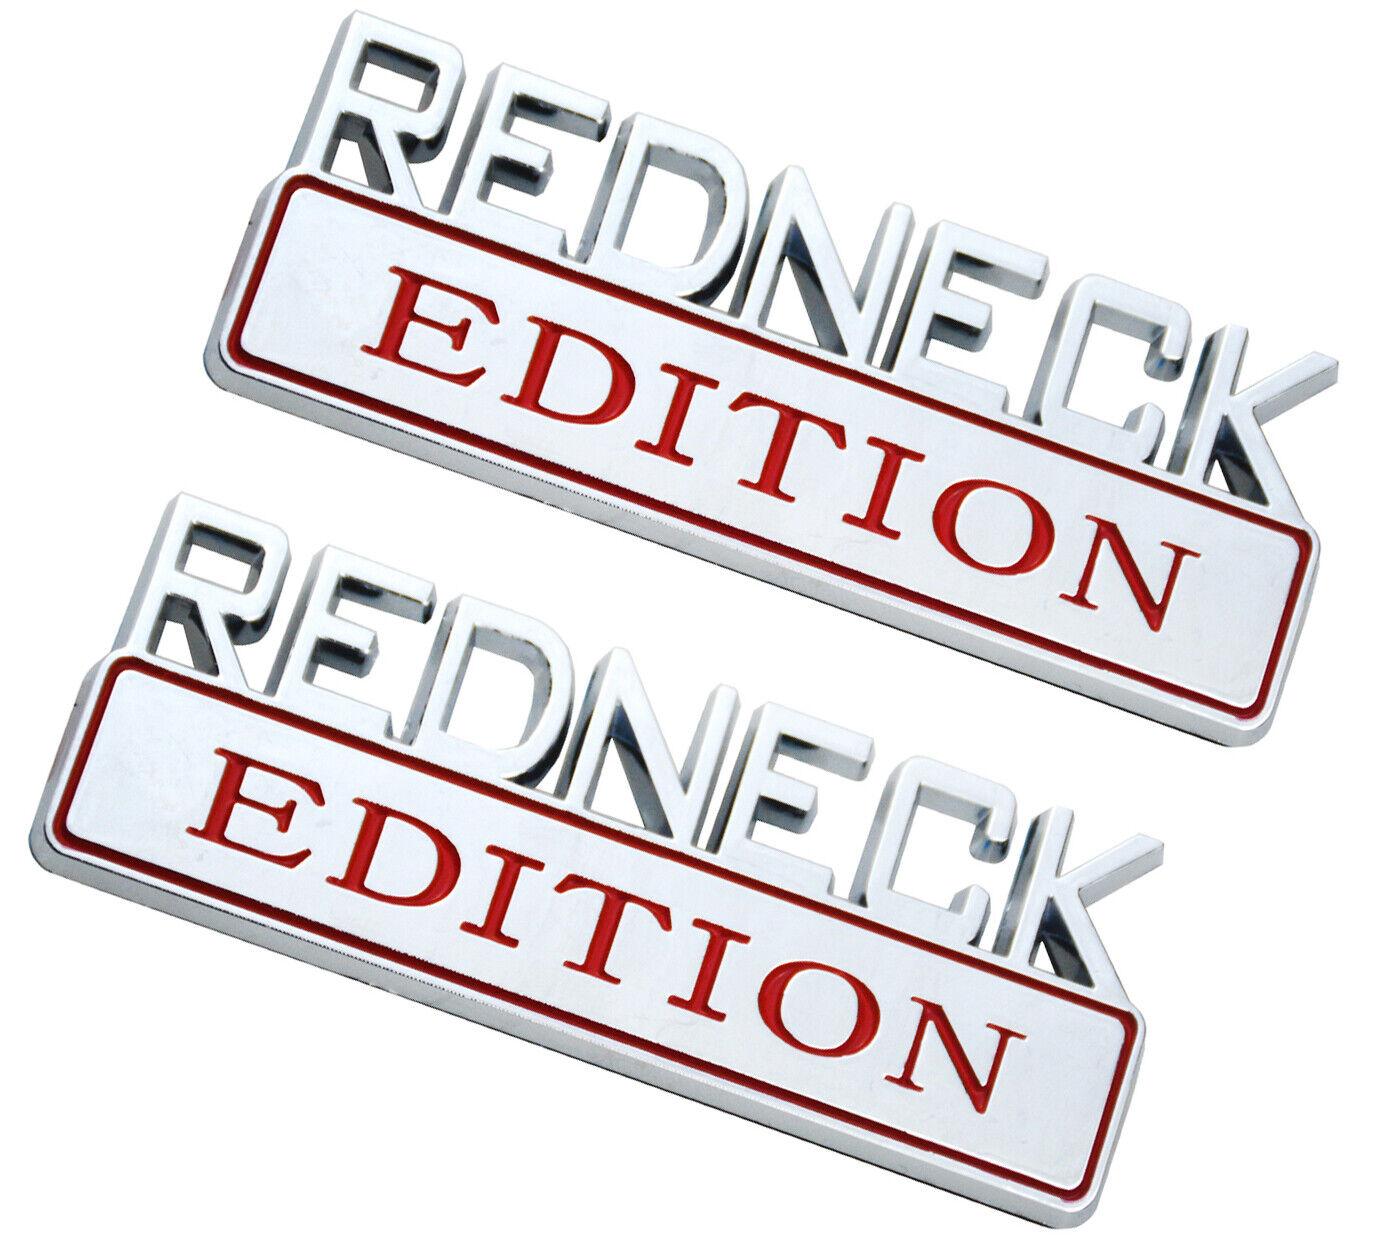 Small Size 2Pcs Black White RED NECK Redneck Edition Emblem Badge 3D Logo Compatible for Chevy Silverado 1500HD 2500HD